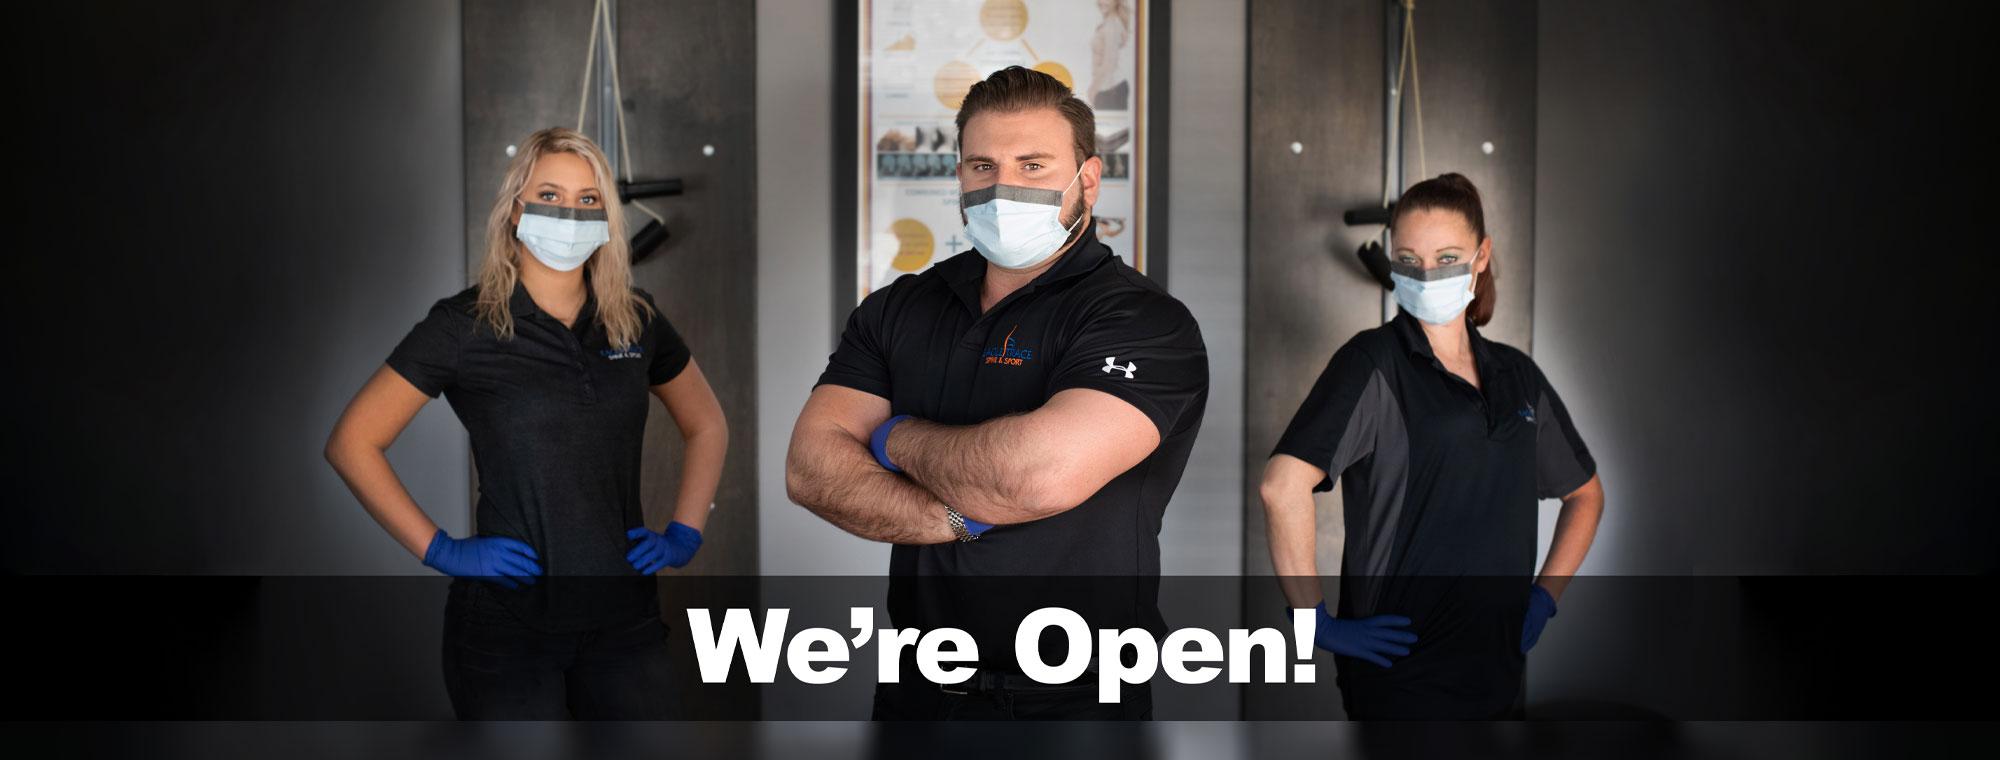 Chiropractor Burnsville MN Jeff Plaster Yes We Are Open